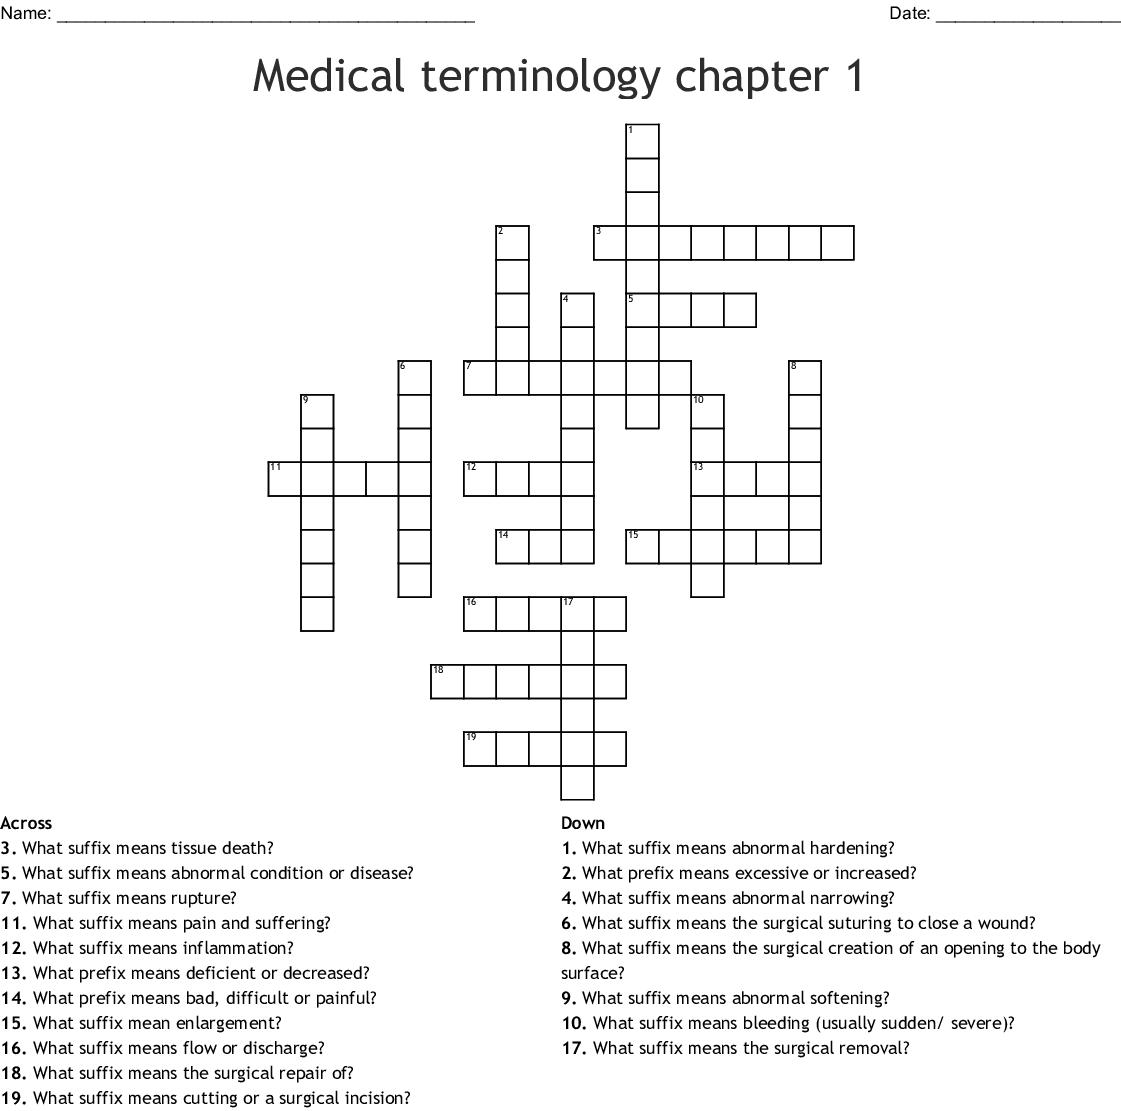 Exo Prefix Medical Term